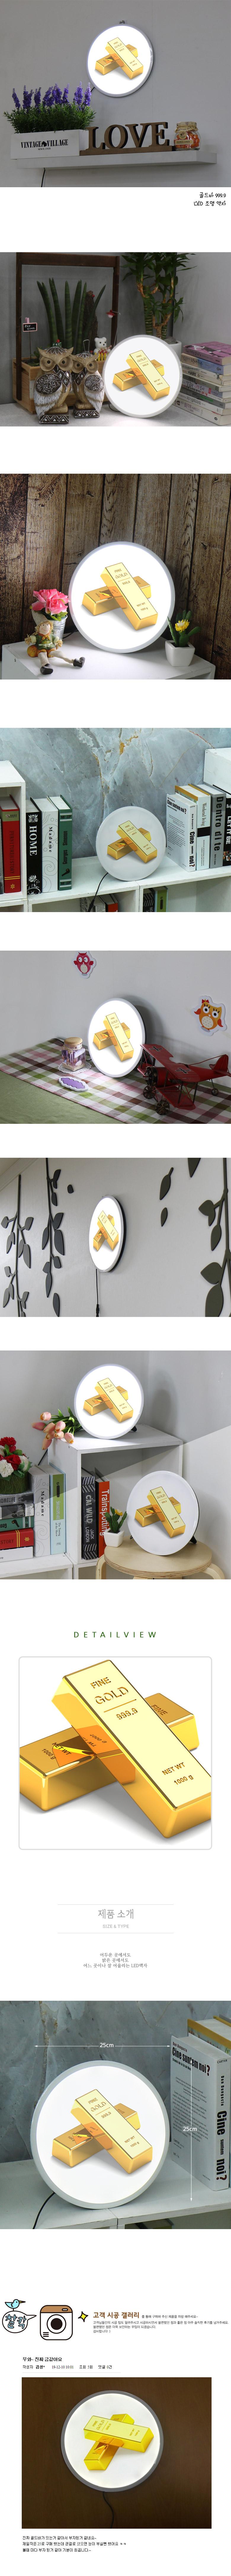 LED액자25R_골드바999.9 - 꾸밈, 38,400원, 포인트조명, 터치조명